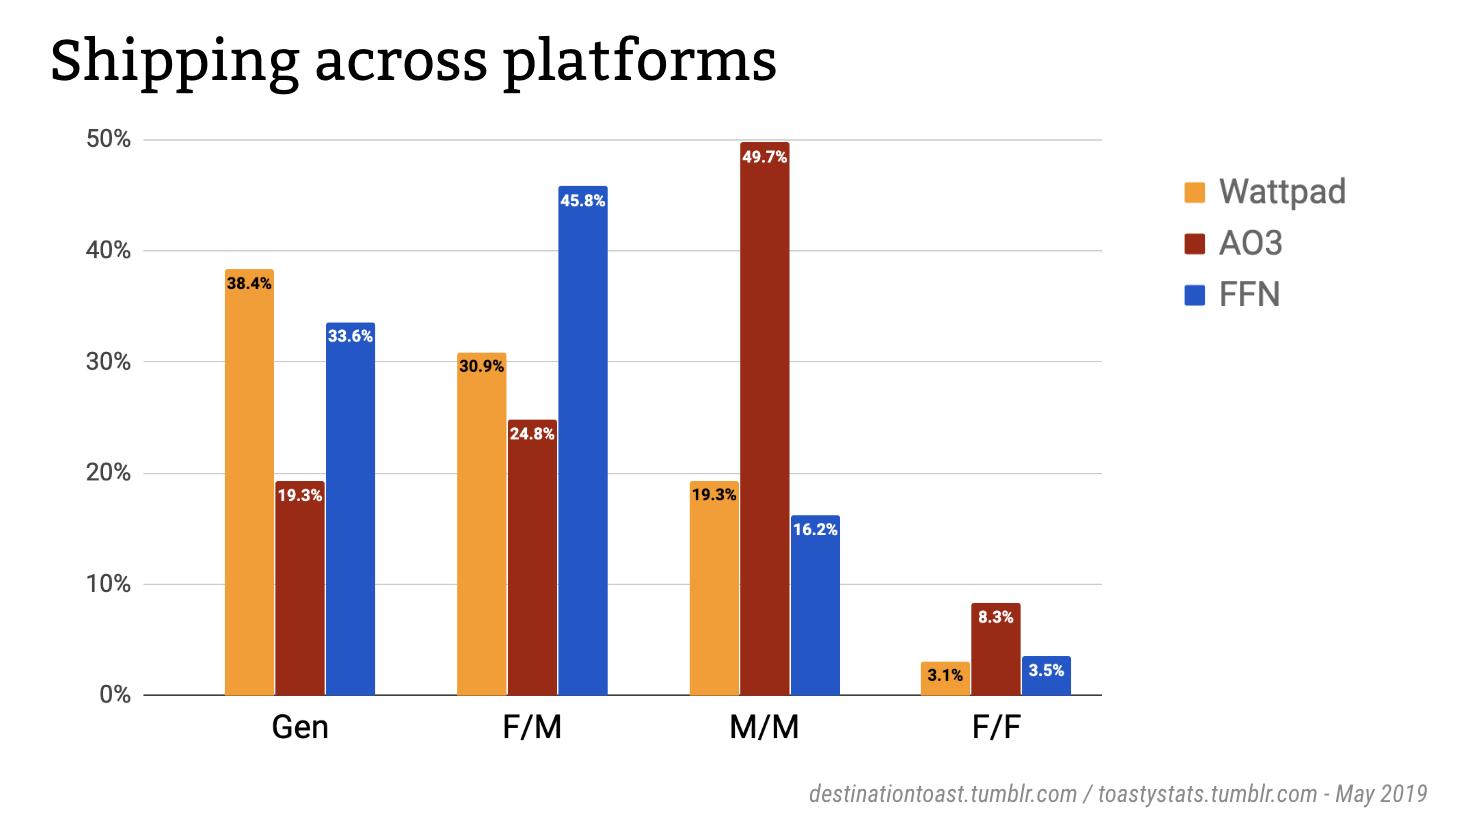 Fandom stats] Shipping on Wattpad vs  AO3 and FFN